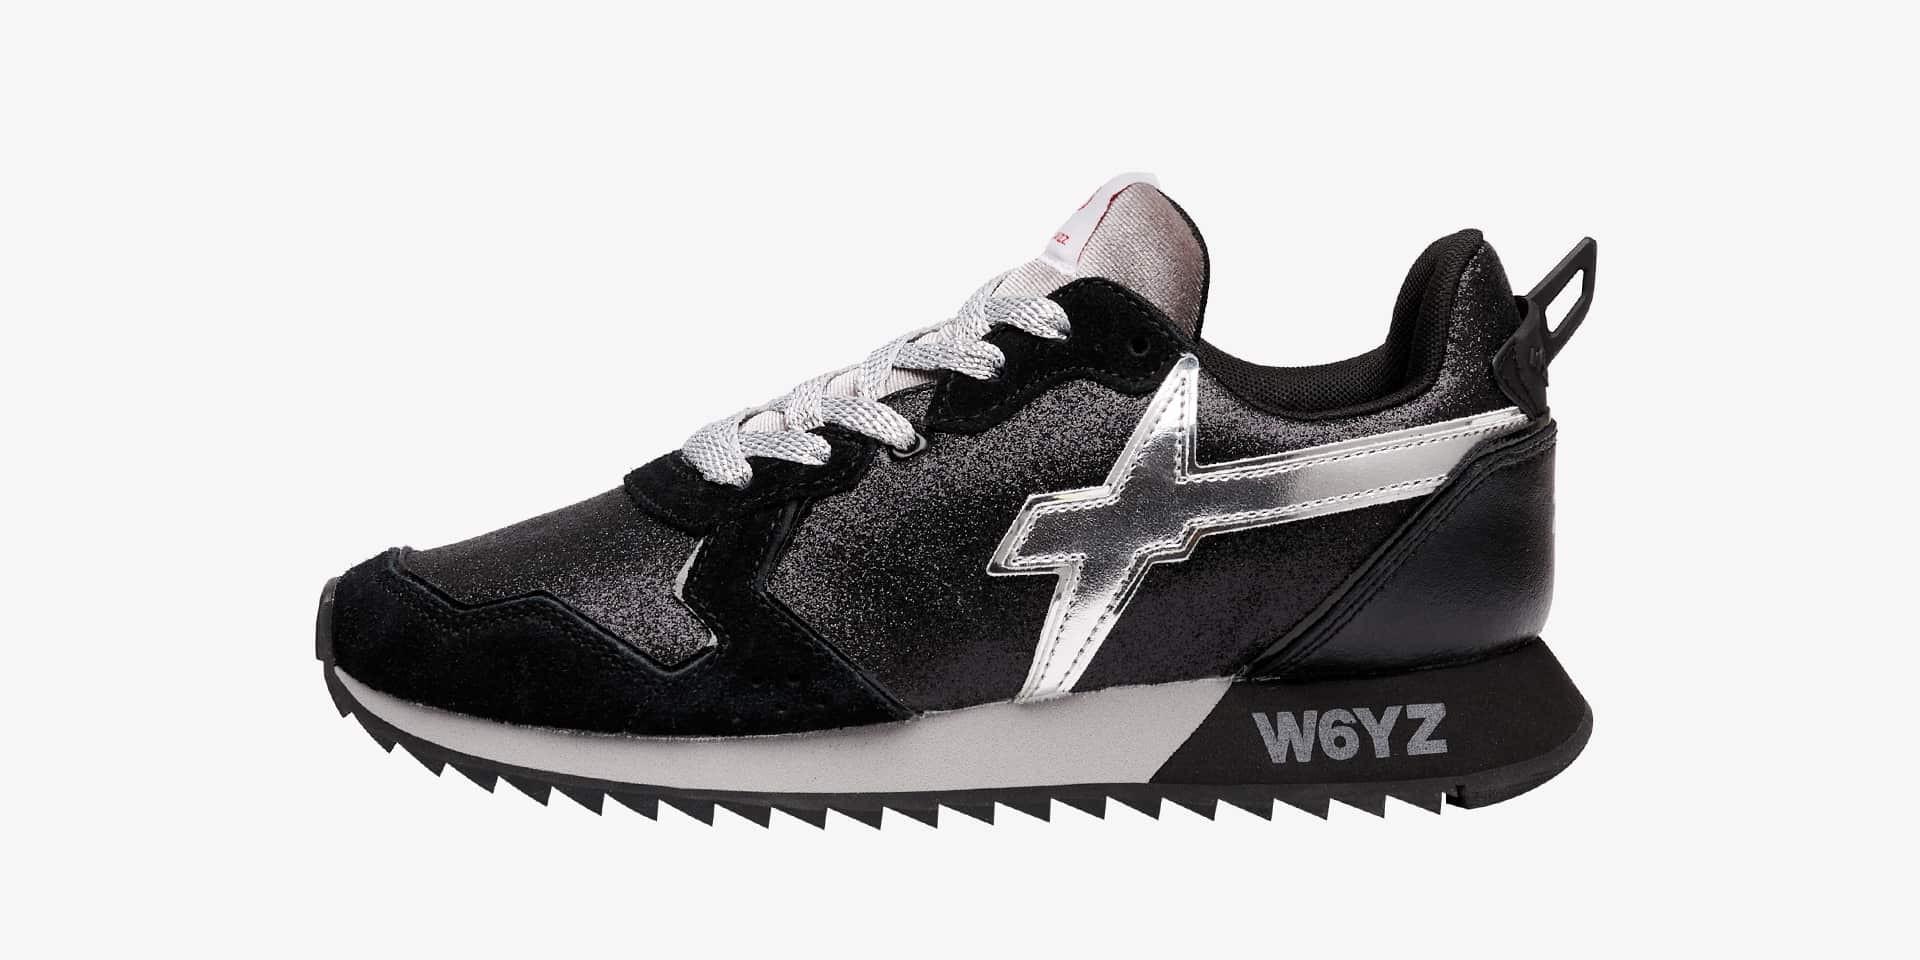 JET-W. - Sneaker in suede e glitter - Nero